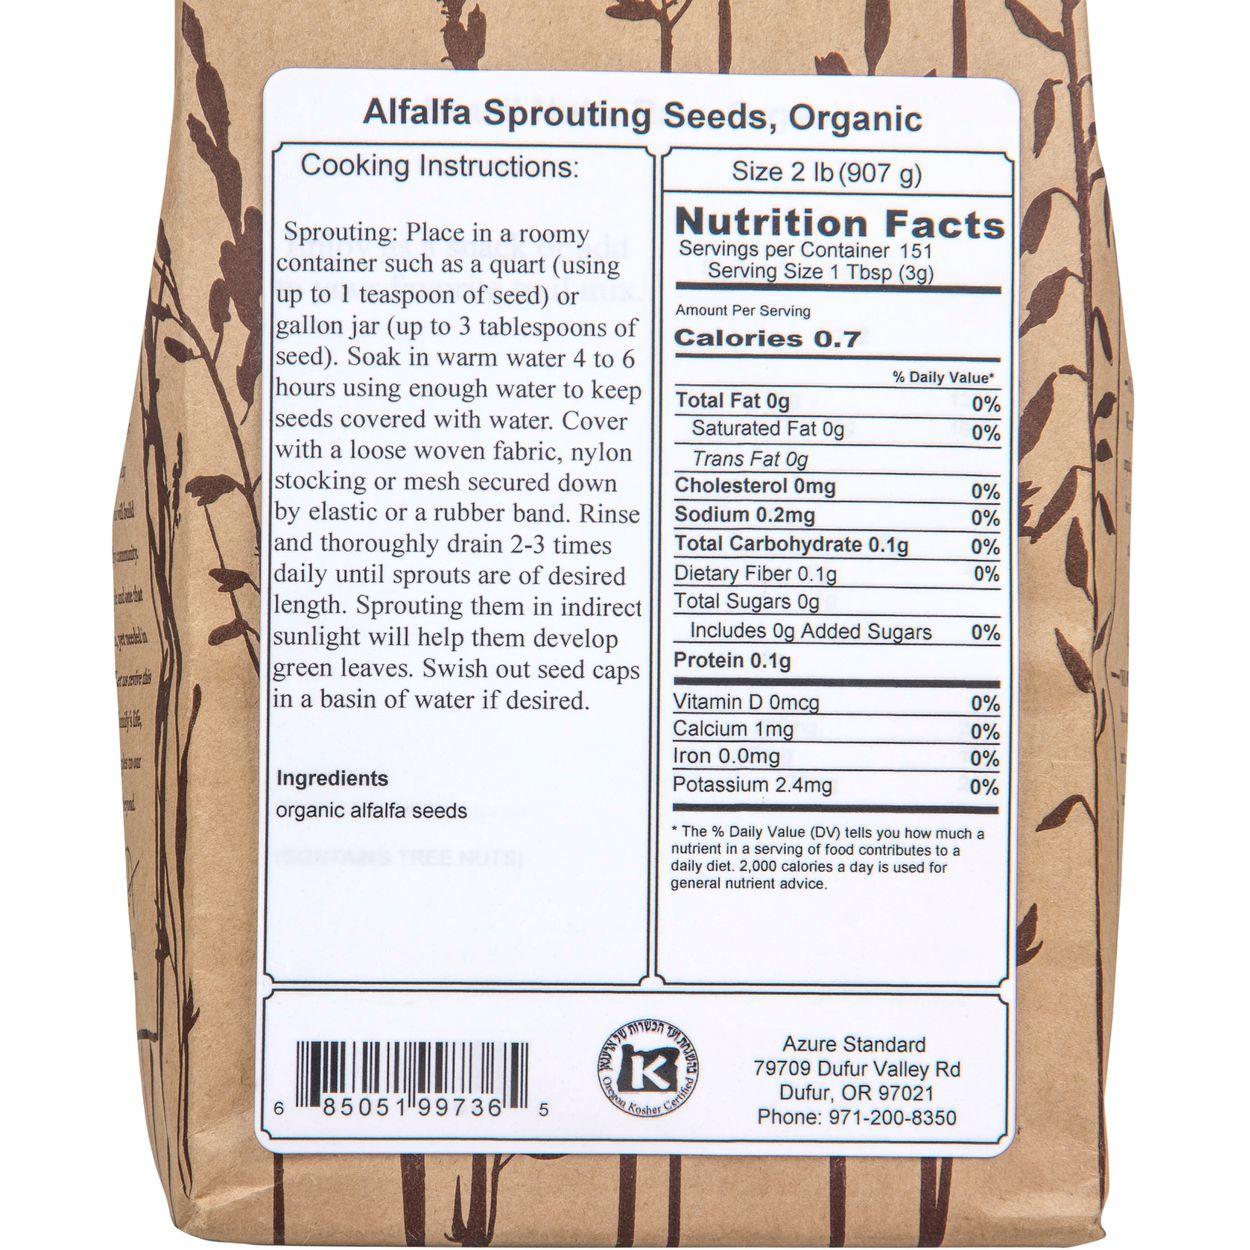 Alfalfa Sprouting Seeds, Organic